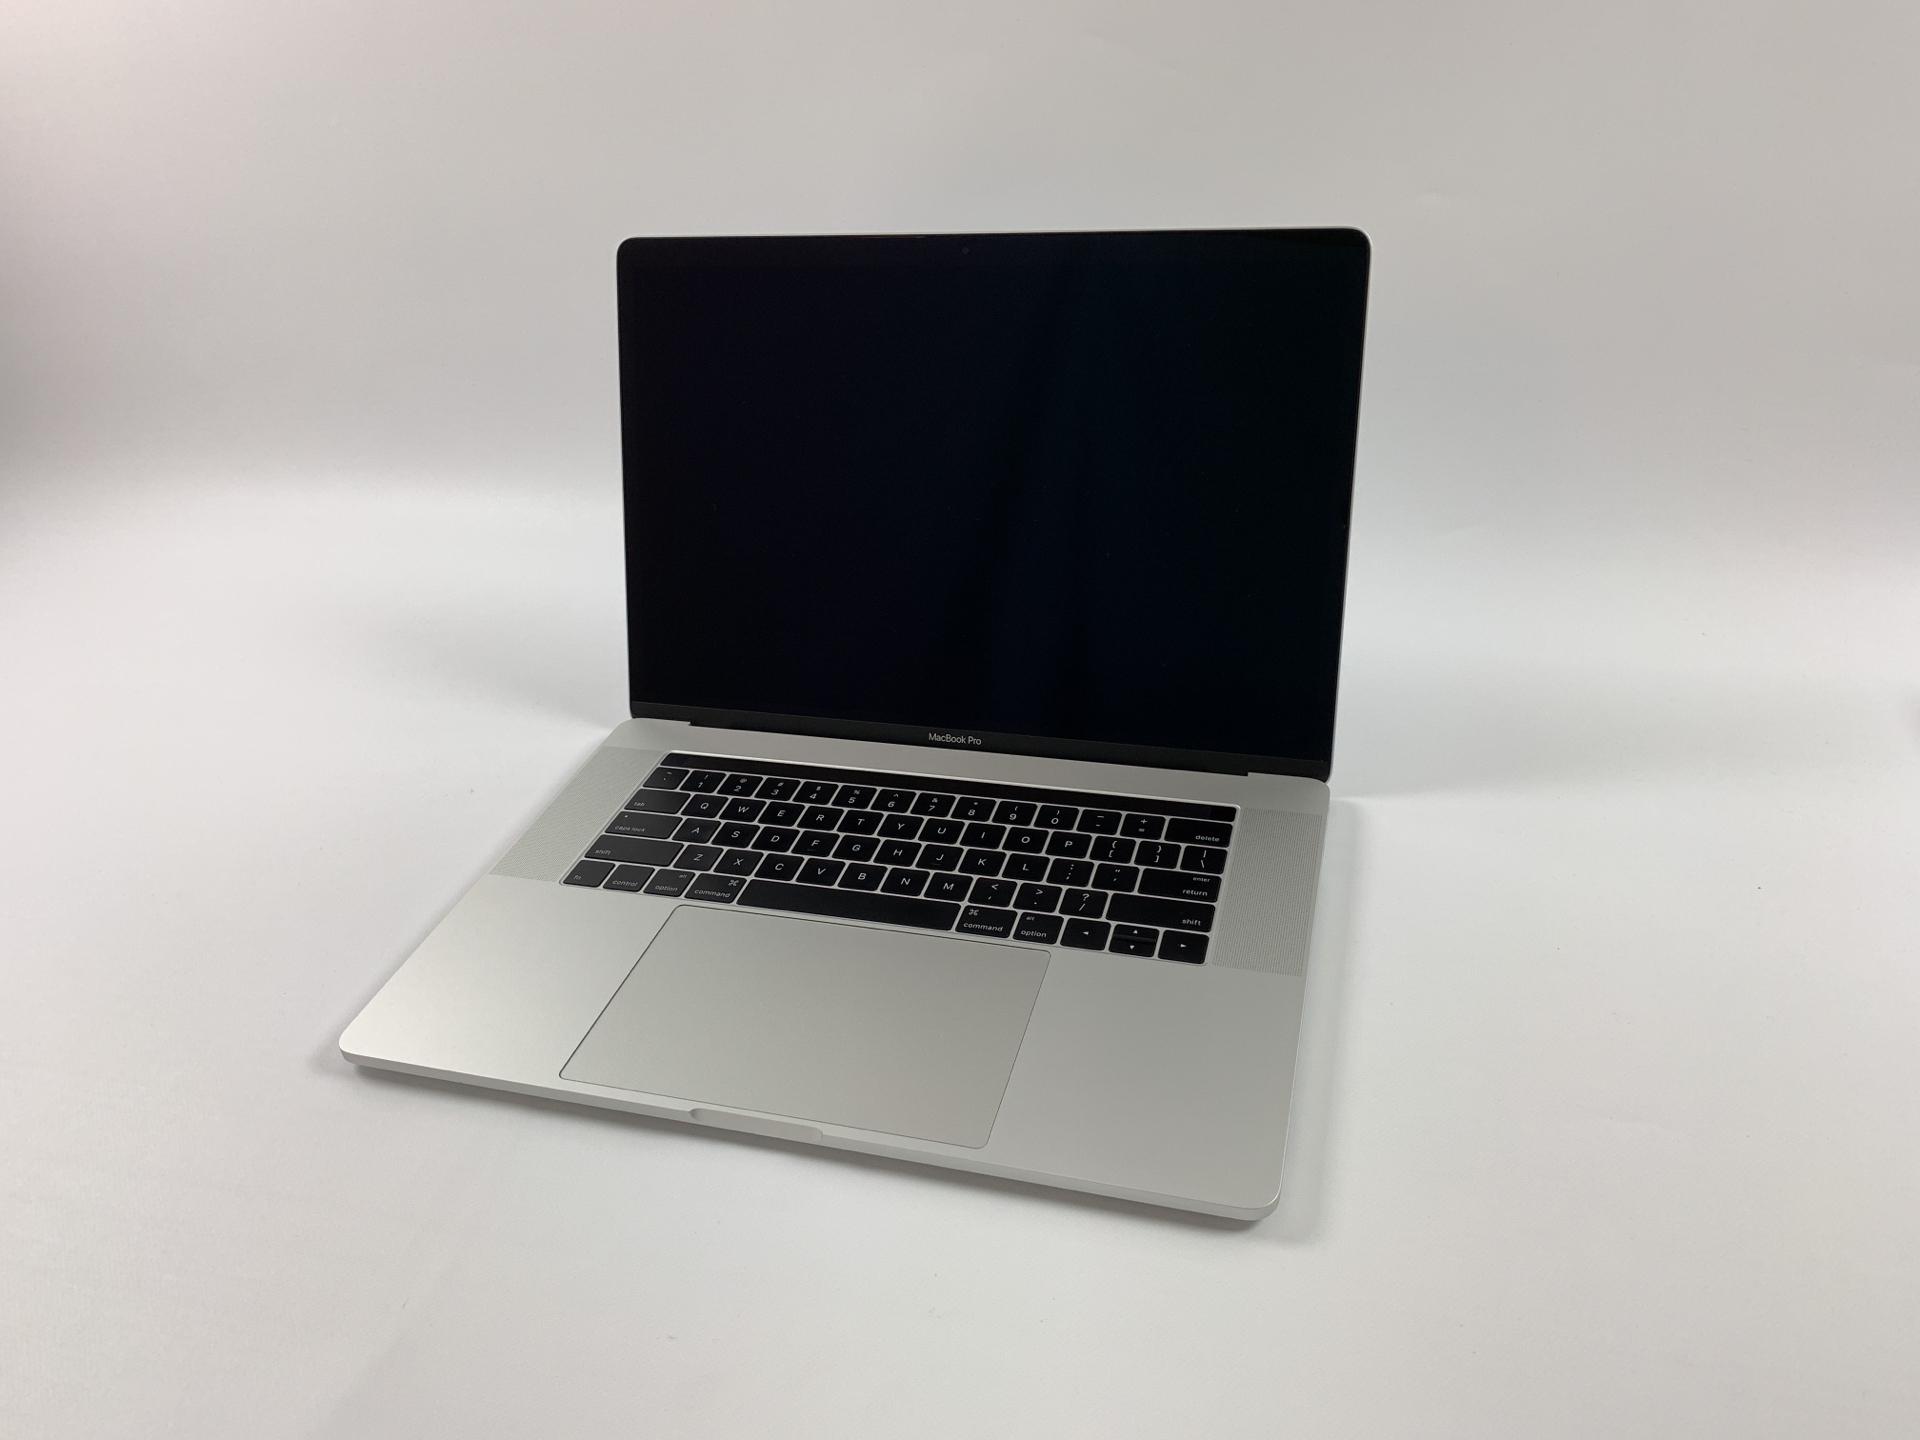 "MacBook Pro 15"" Touch Bar Late 2016 (Intel Quad-Core i7 2.7 GHz 16 GB RAM 512 GB SSD), Silver, Intel Quad-Core i7 2.7 GHz, 16 GB RAM, 512 GB SSD, bild 1"